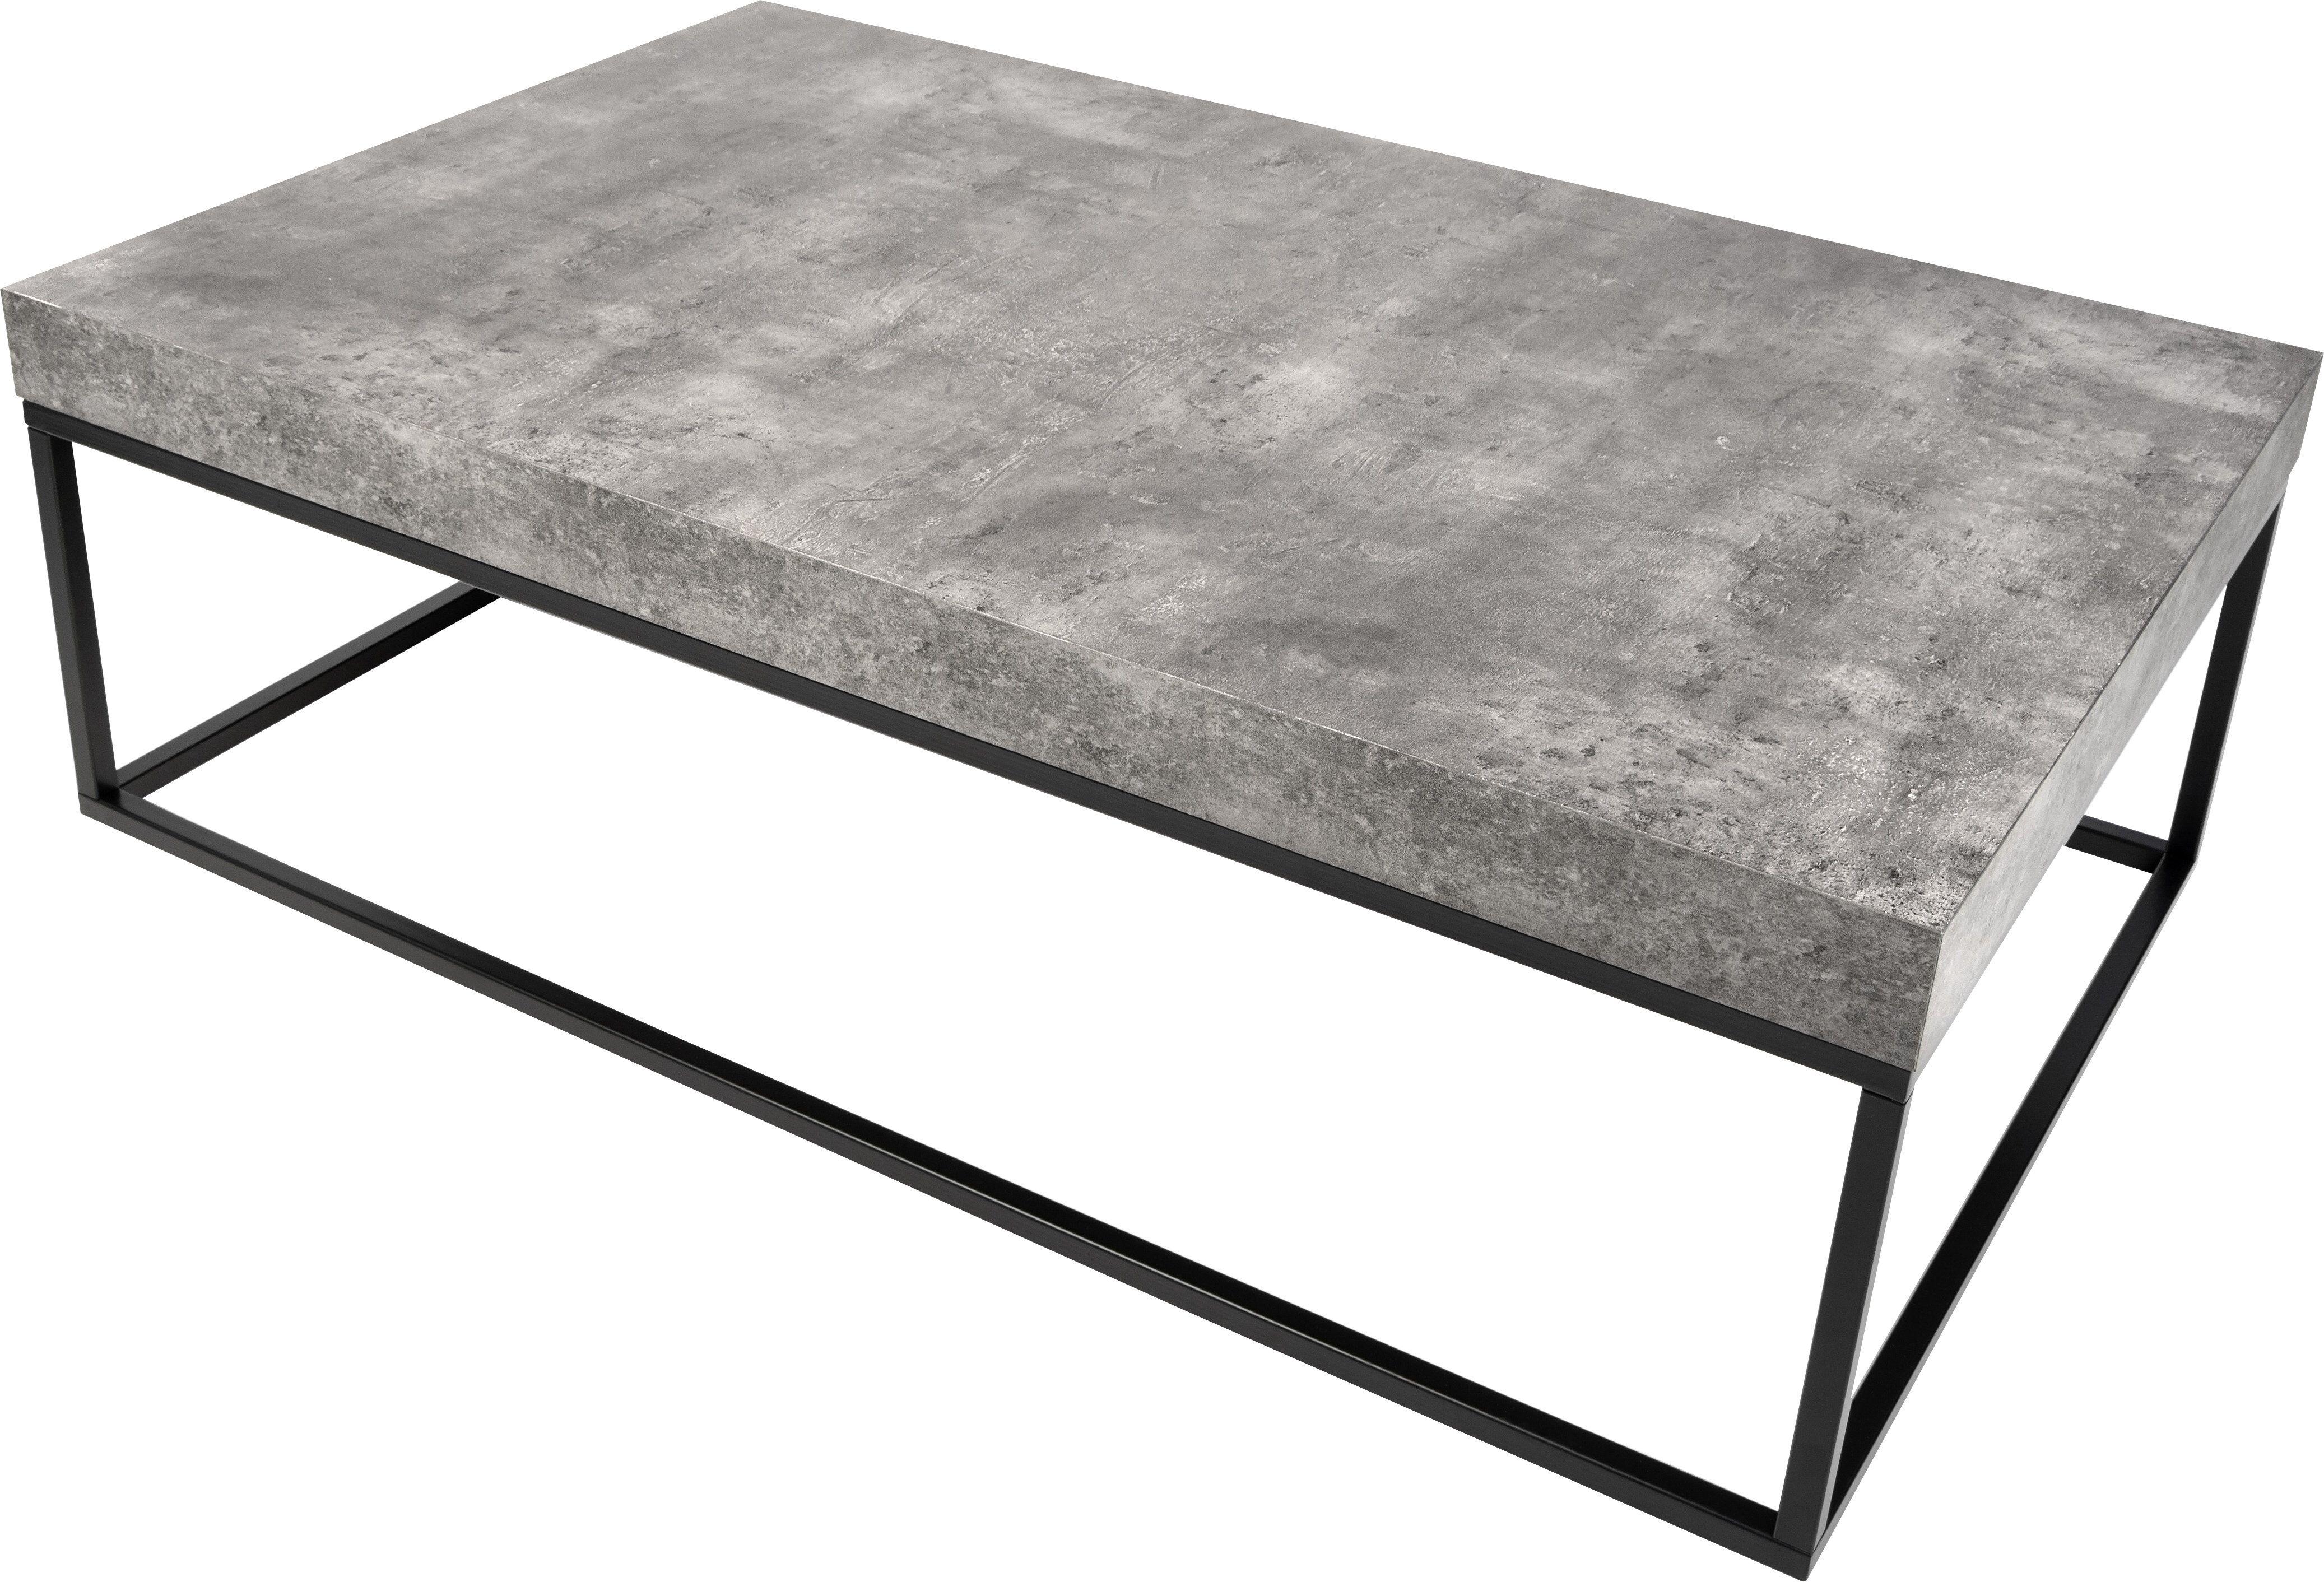 Lorsworth Coffee Table Coffee Table Rectangle Coffee Table